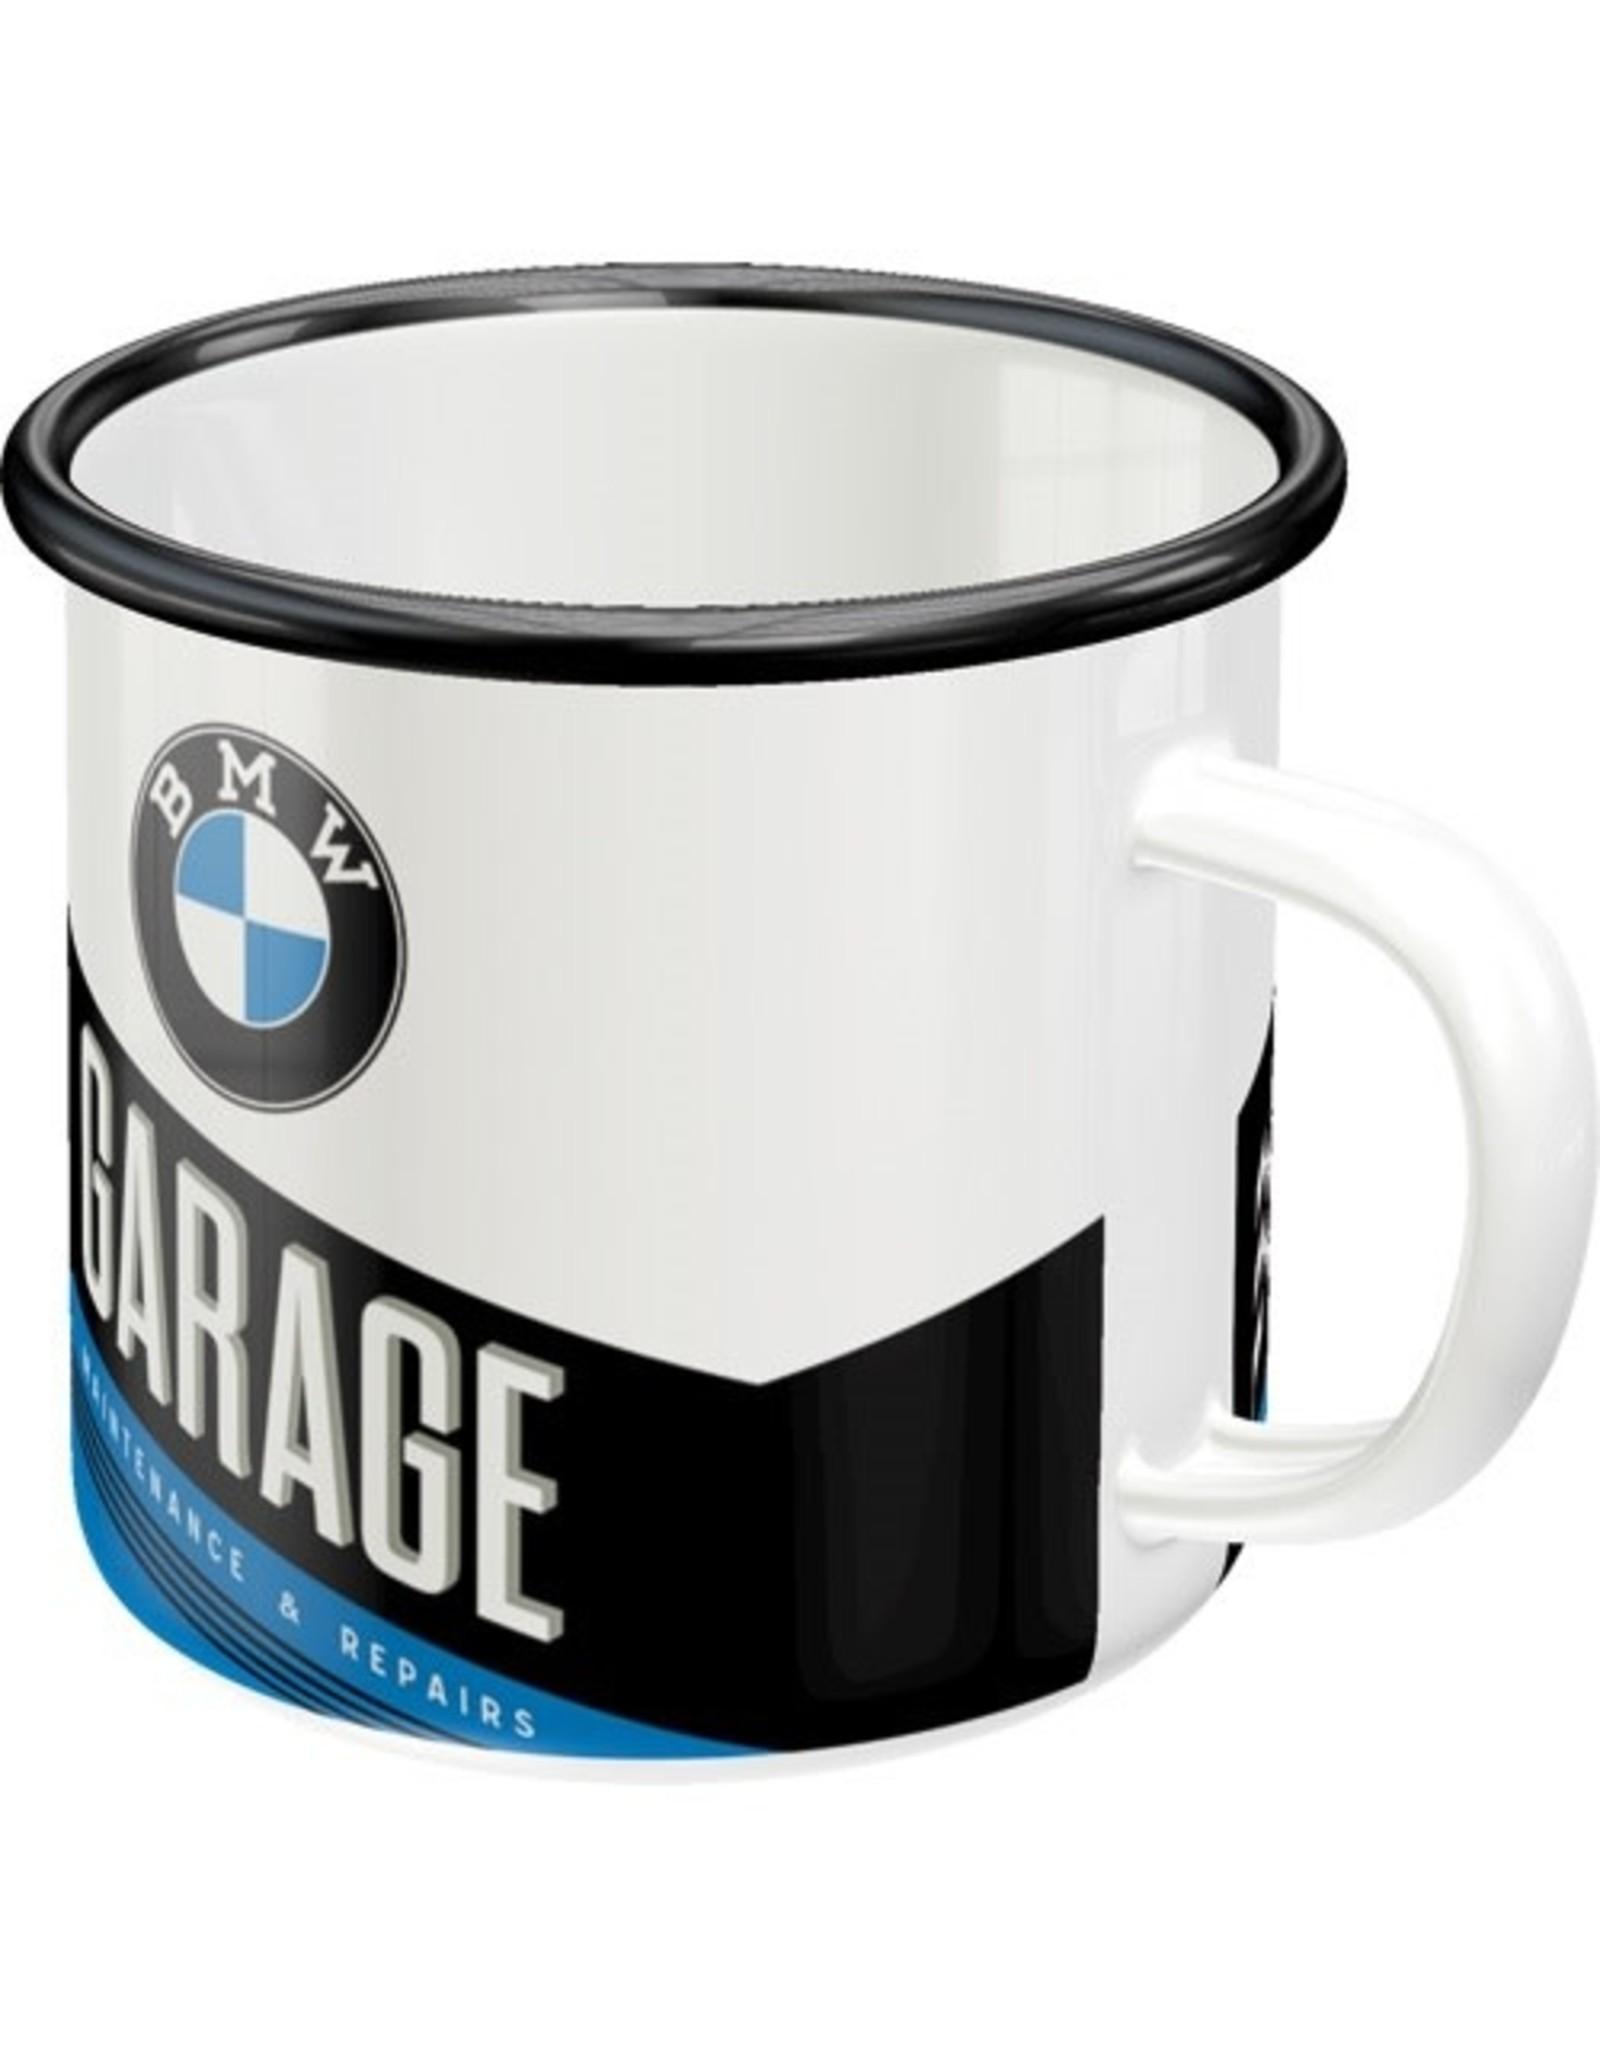 enamel mug - BMW garage (4)